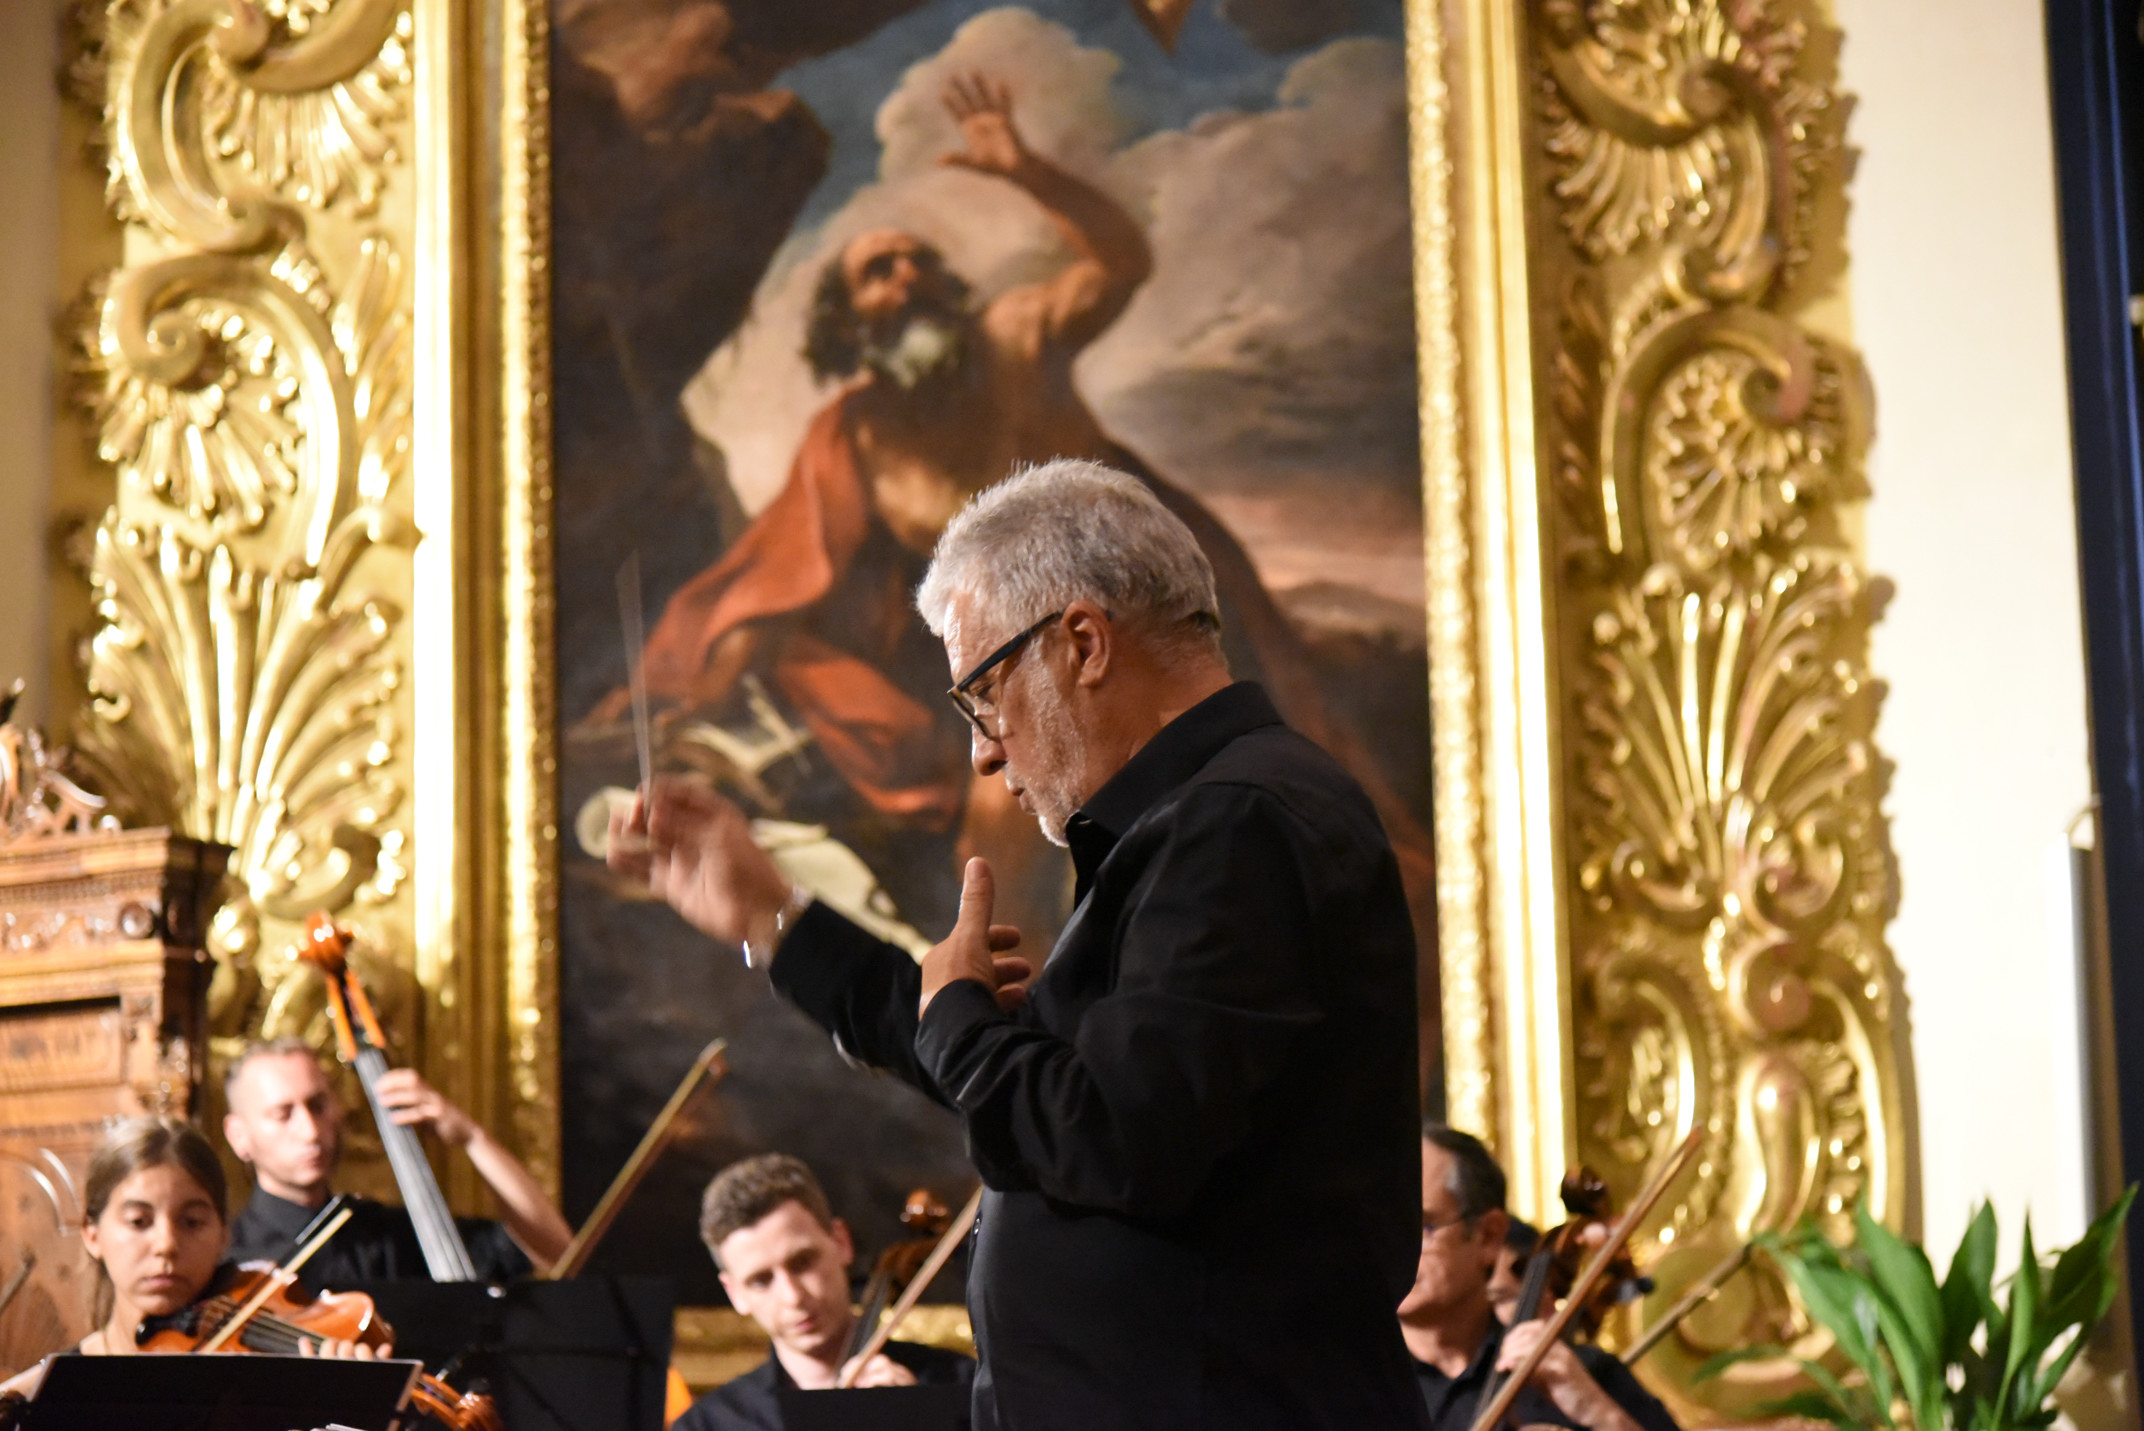 http://orquestatutti.com/wp/wp-content/uploads/2017/06/DSC_0267_15.jpg